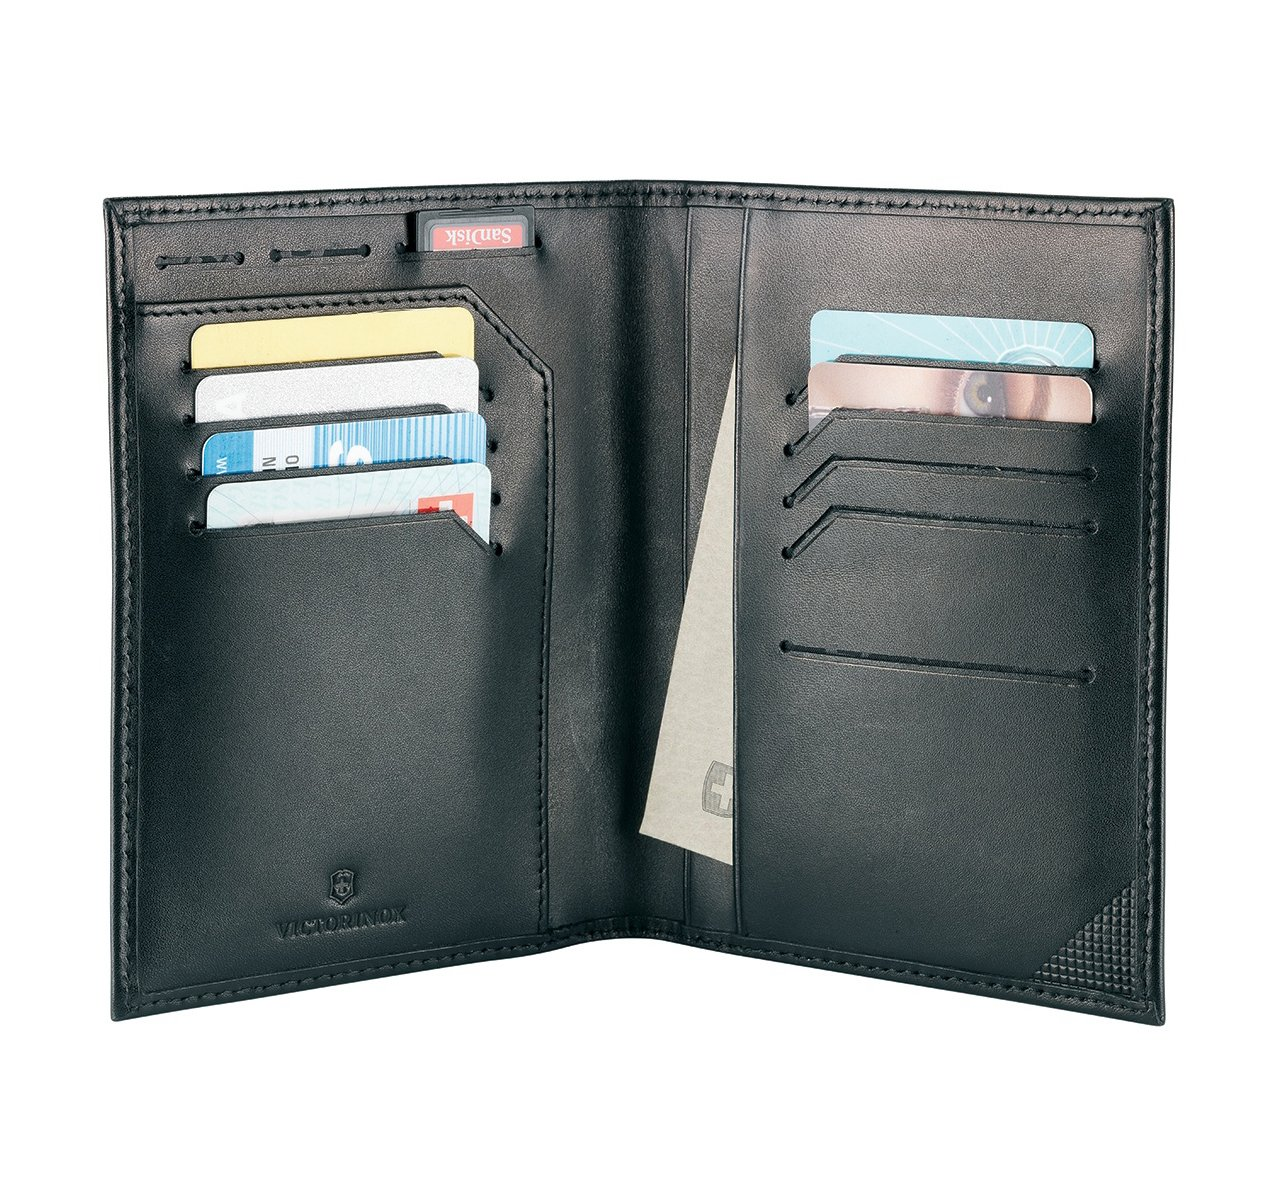 Victorinox Men's Altius Edge Leibnitz Passport Cover with RFID, black leather, L by Victorinox